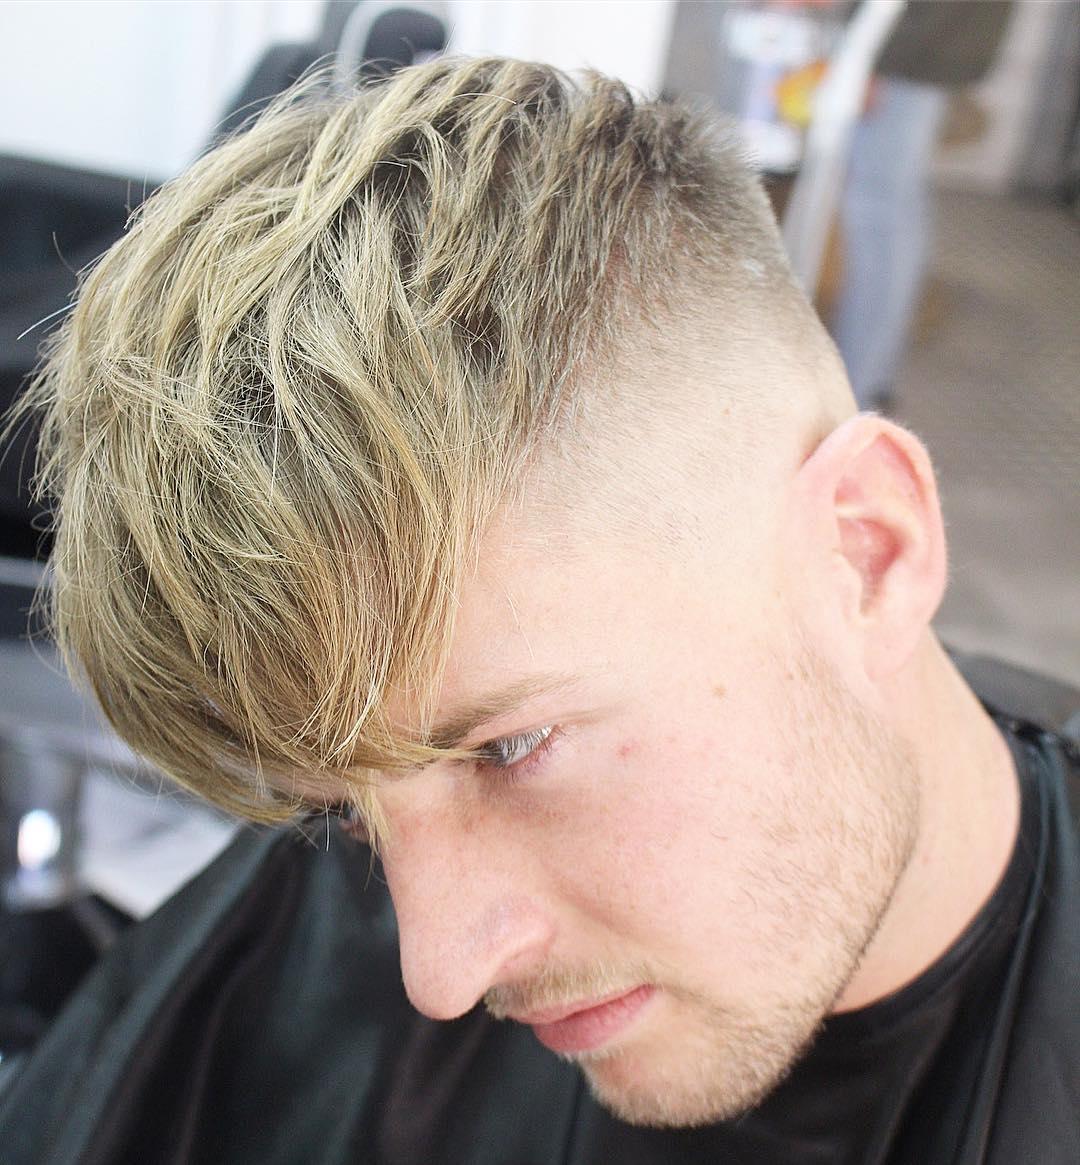 Trending Hairstyles For Men top trending hairstyles for men High Skin Fade Haircut Long Fringe